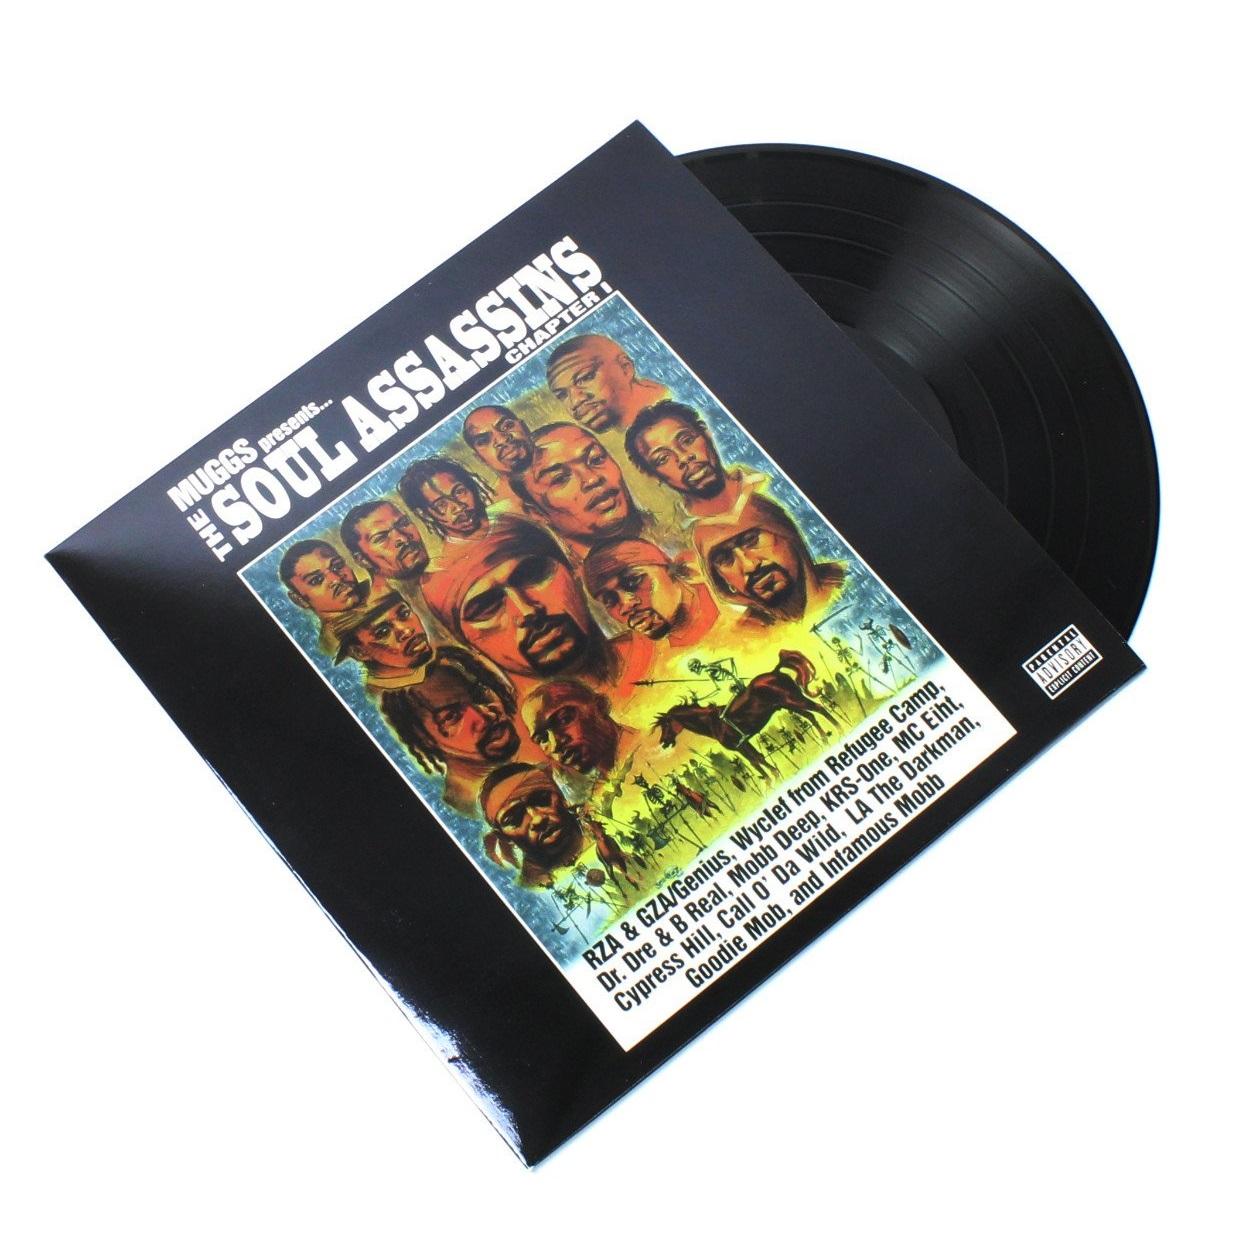 Dj Muggs - Vinyl The Soul Assassins Chapter 1 (2LP)